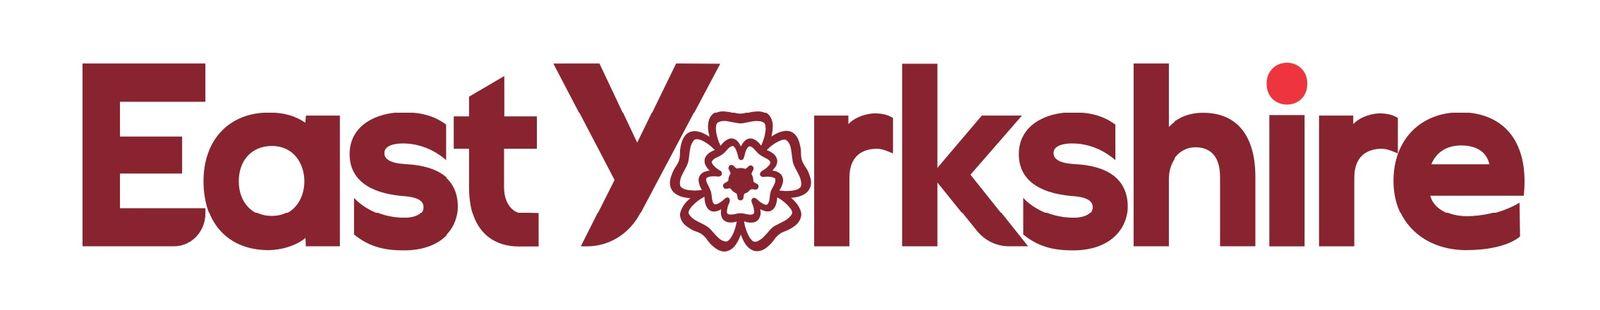 east-yorkshire